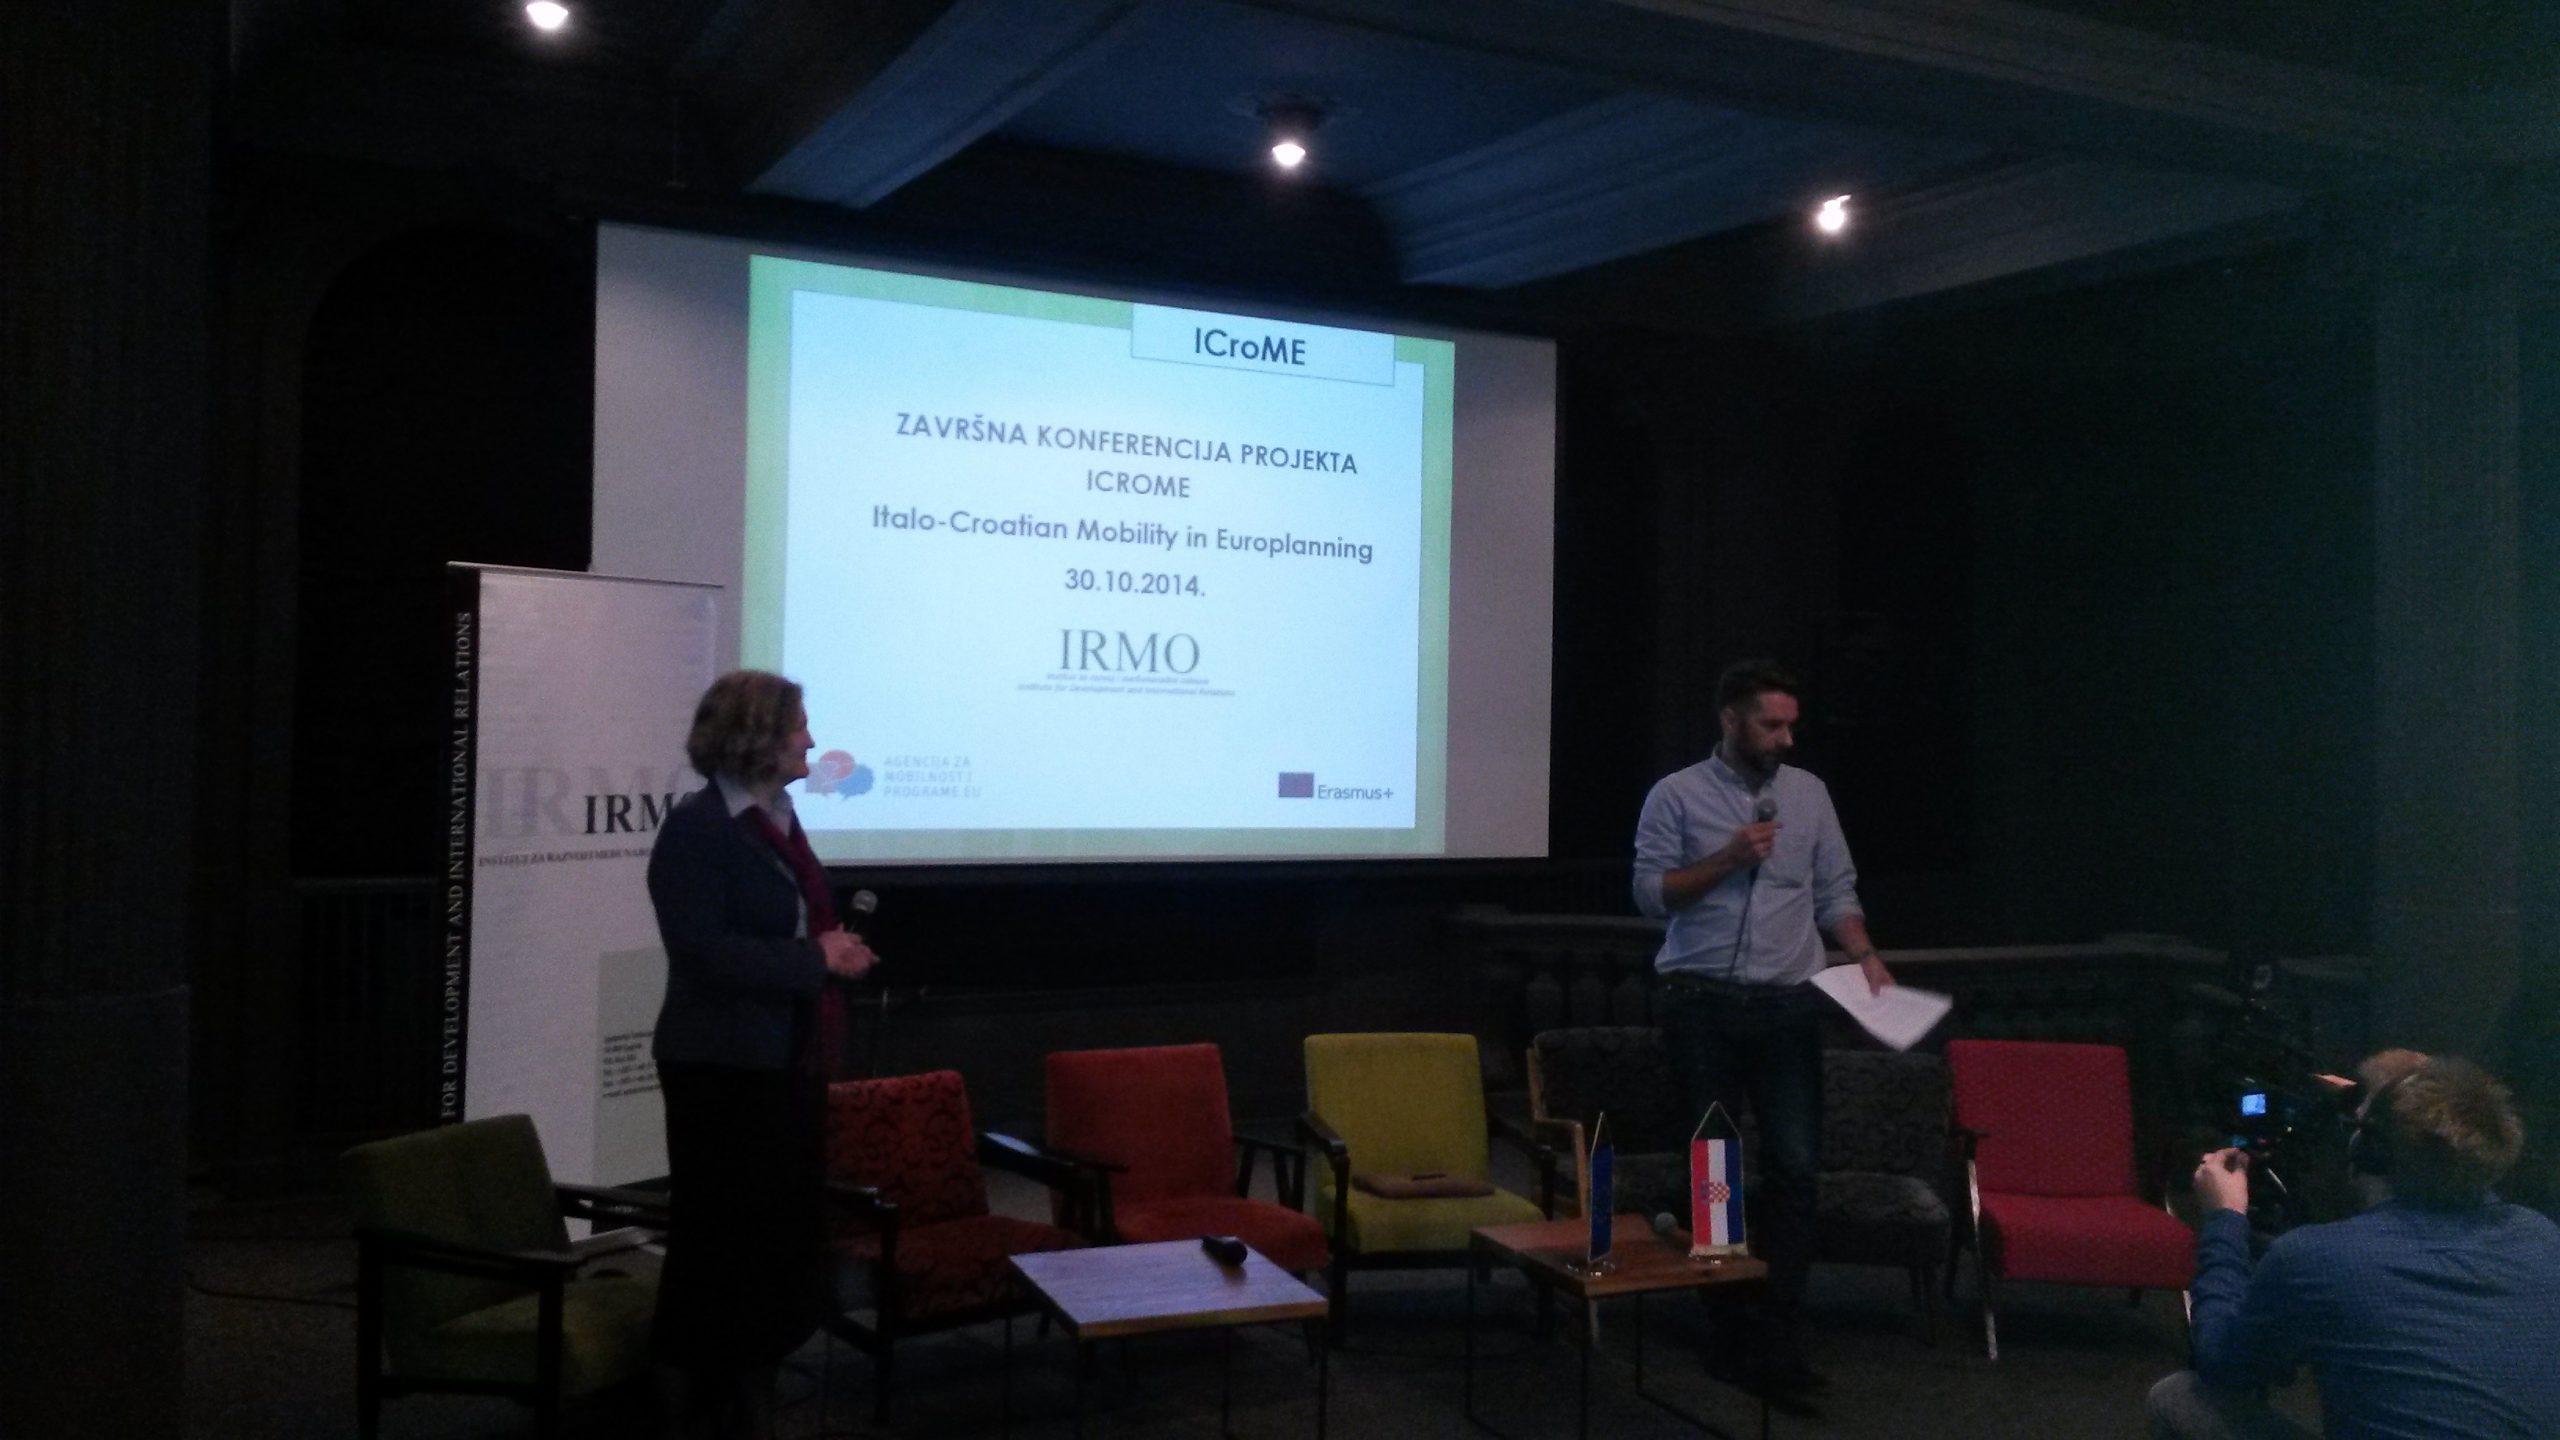 Održana završna konferencija projekta ICroME – Italo-Croatian Mobility in Europlanning